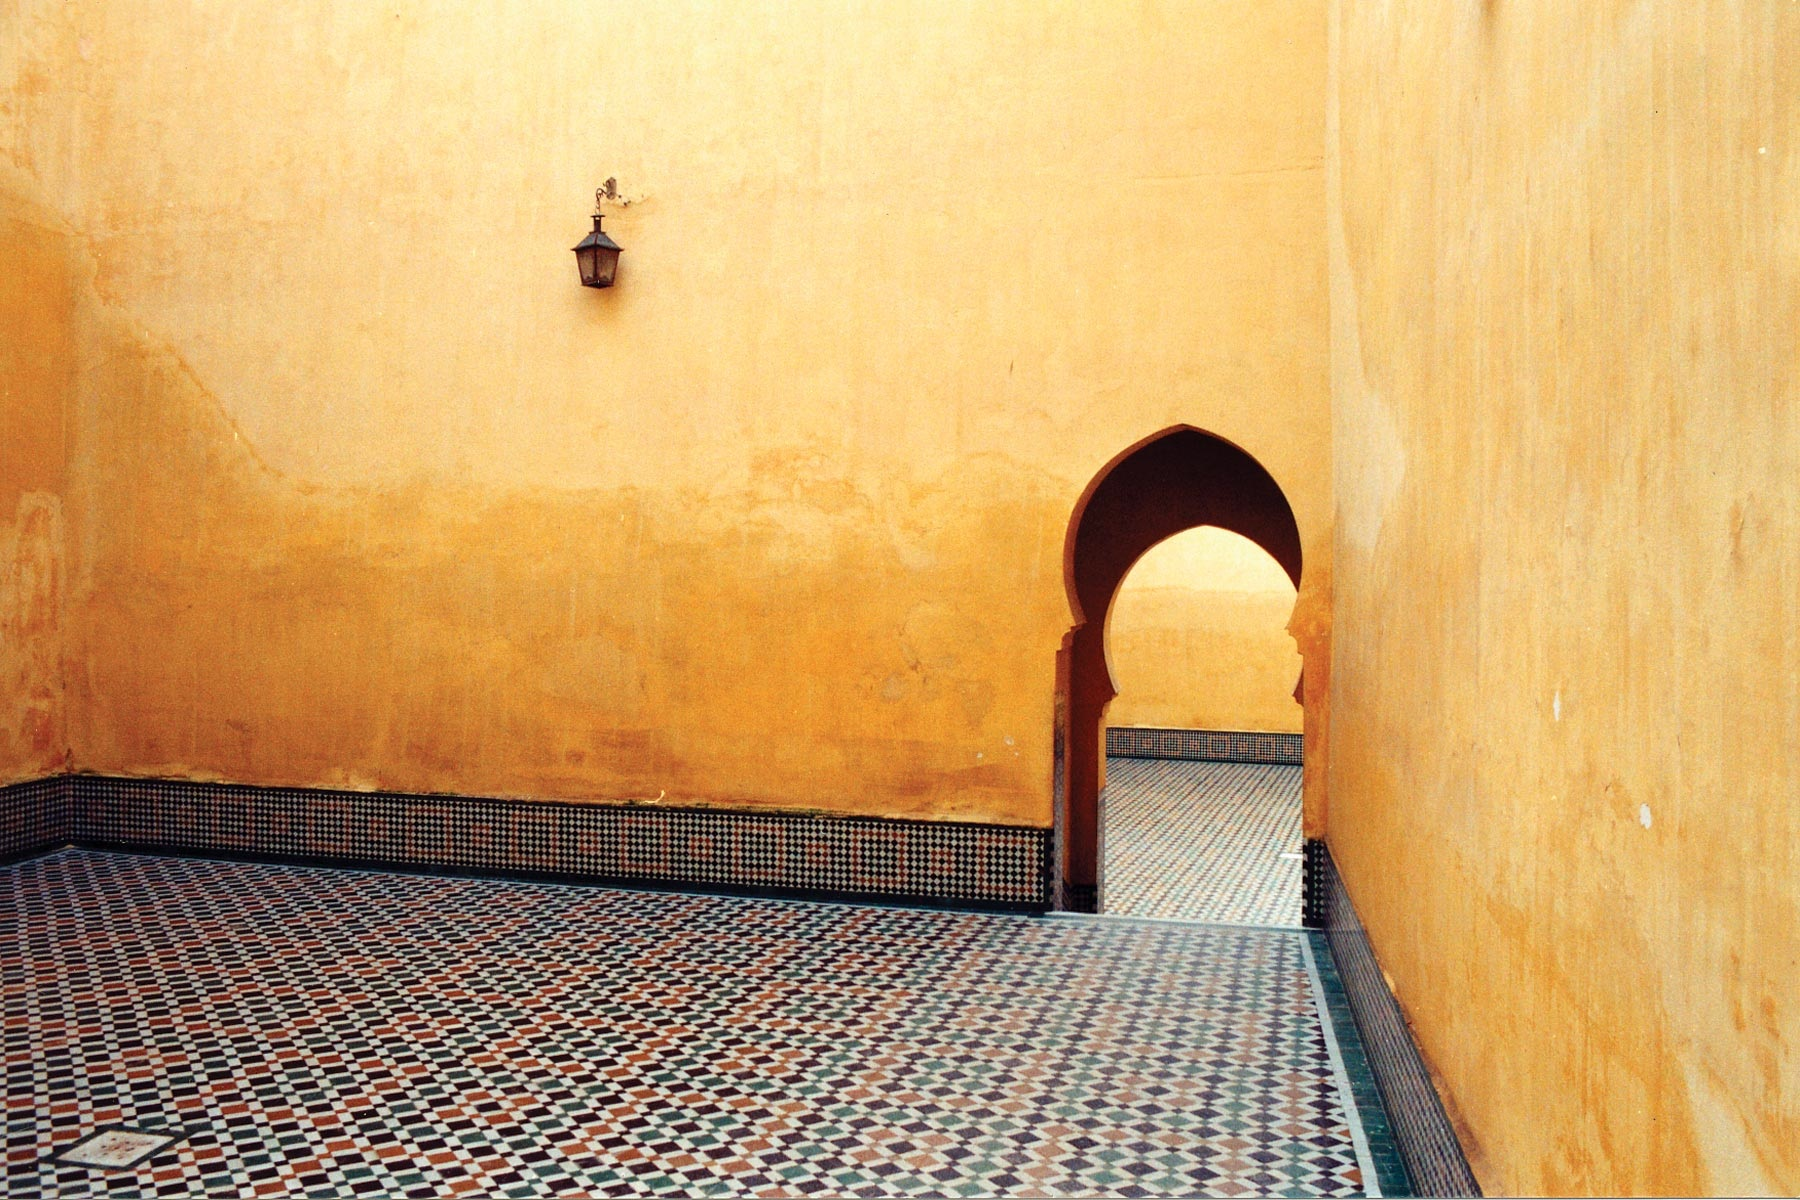 Palace-Courtyard-Meknes-Morocco